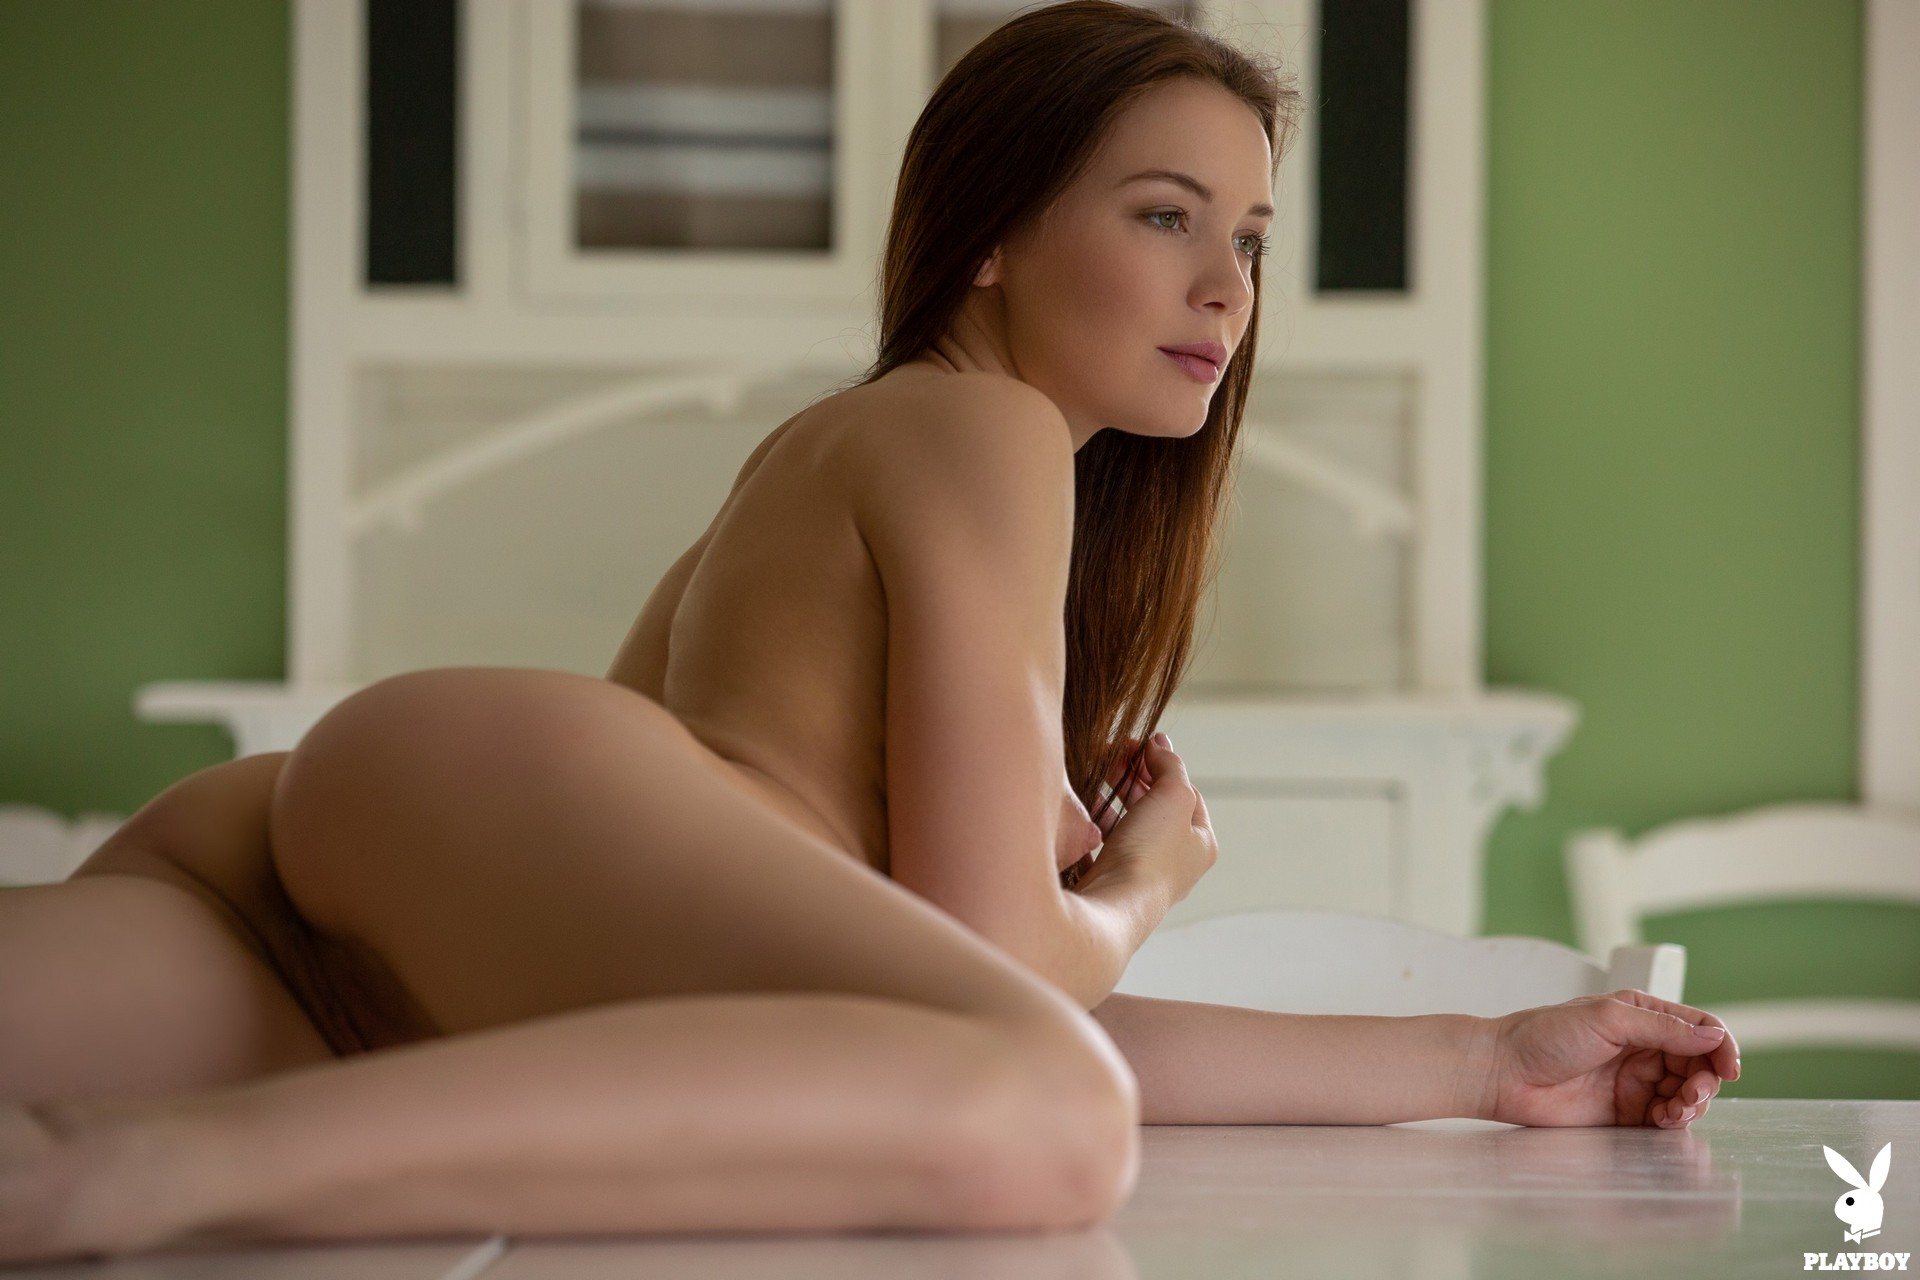 Janeth Tense in Delightful Daybreak - Playboy Plus 24